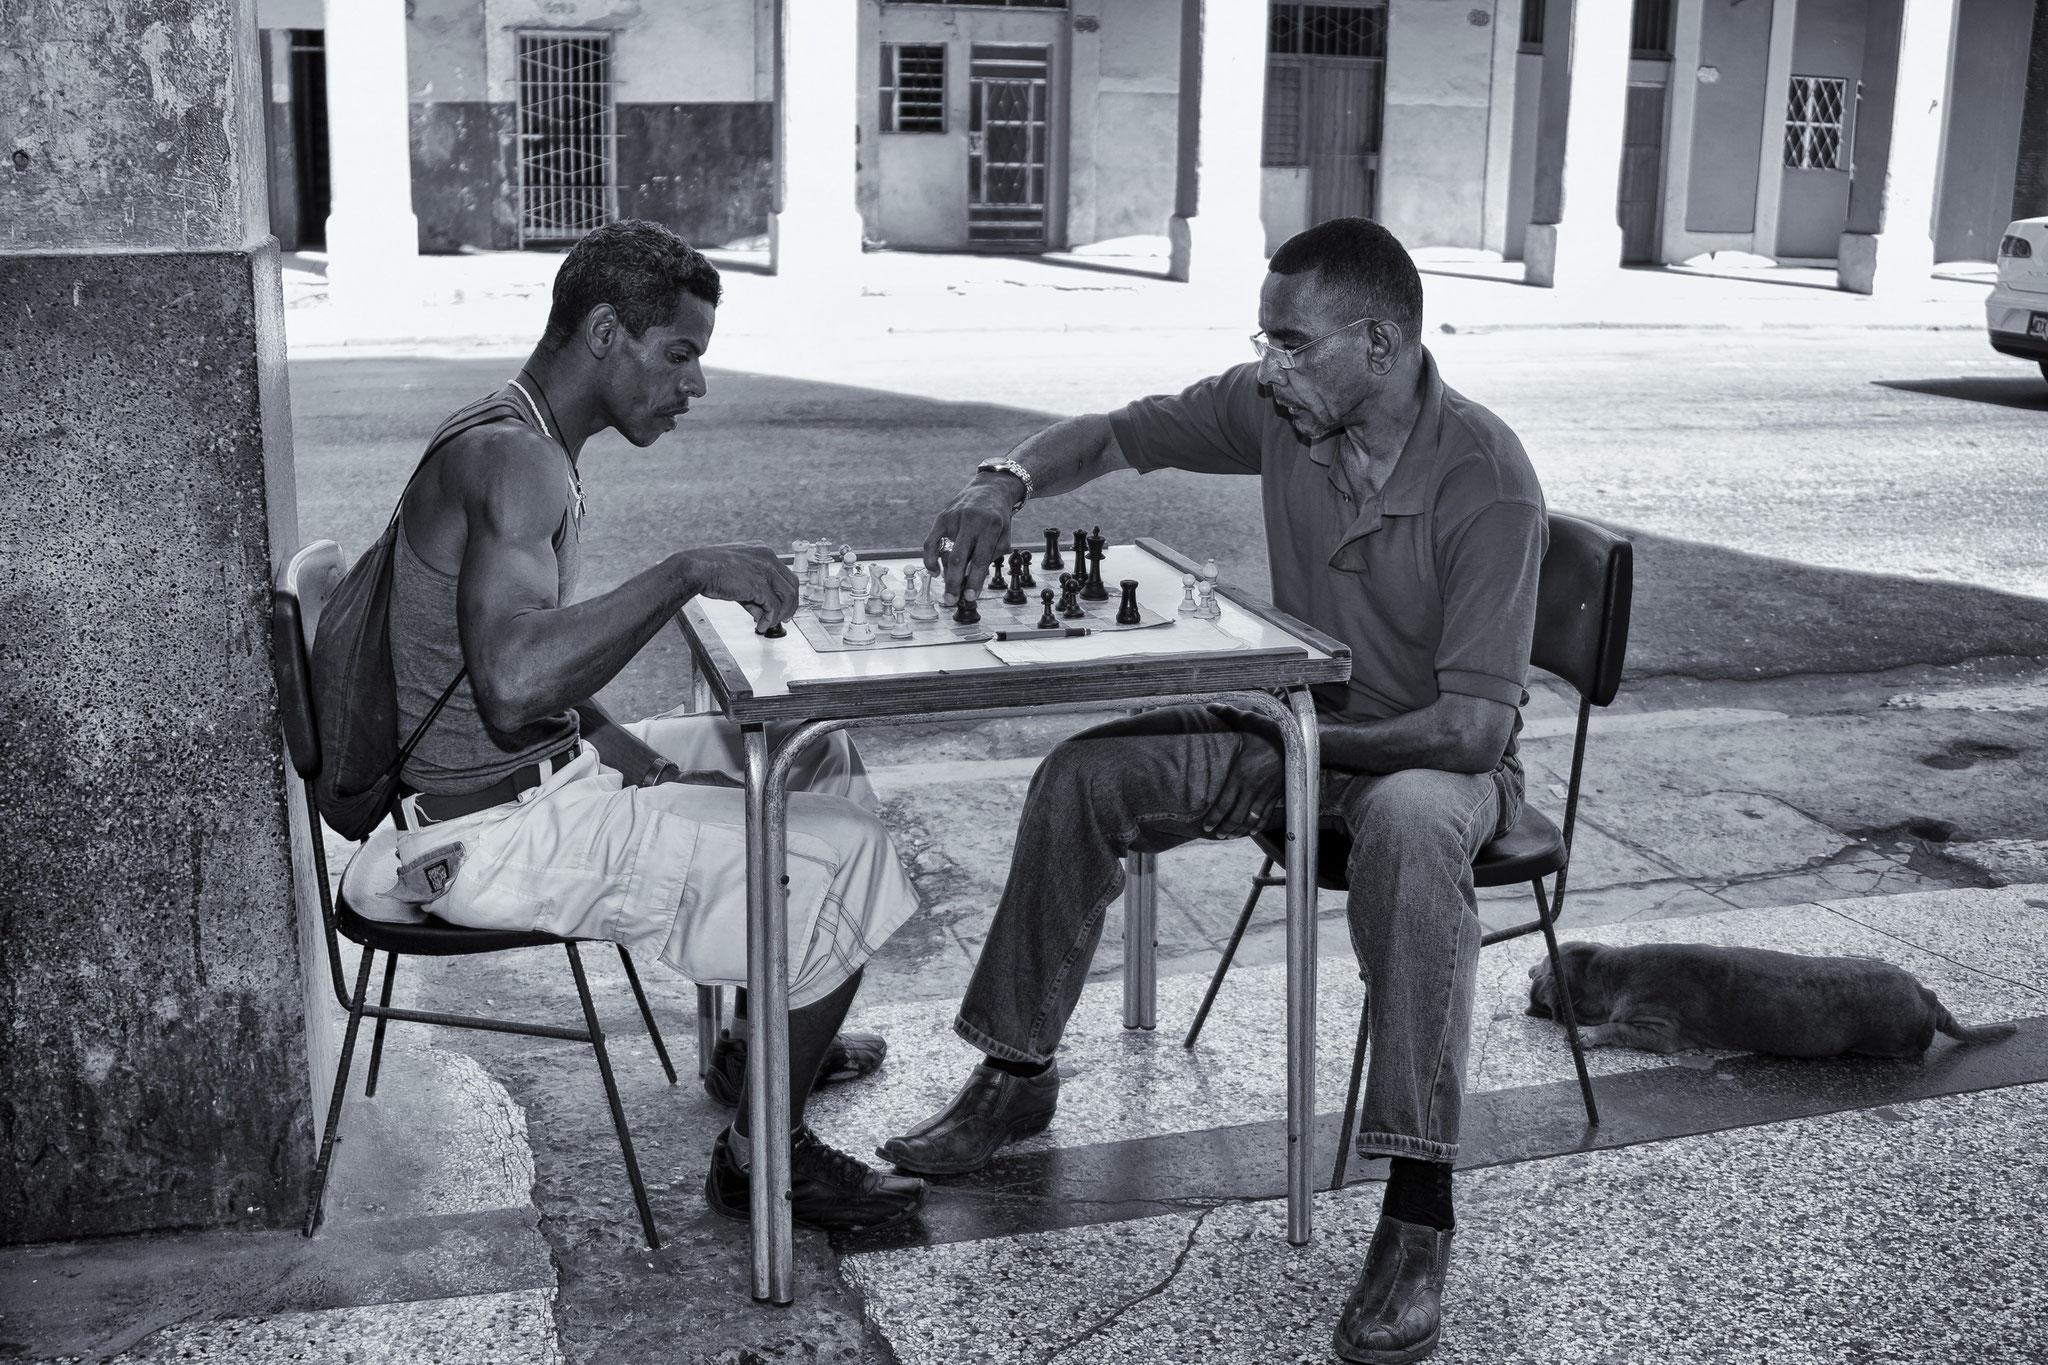 © Hans G. Lehmann | Schachspieler in Havanna, Kuba